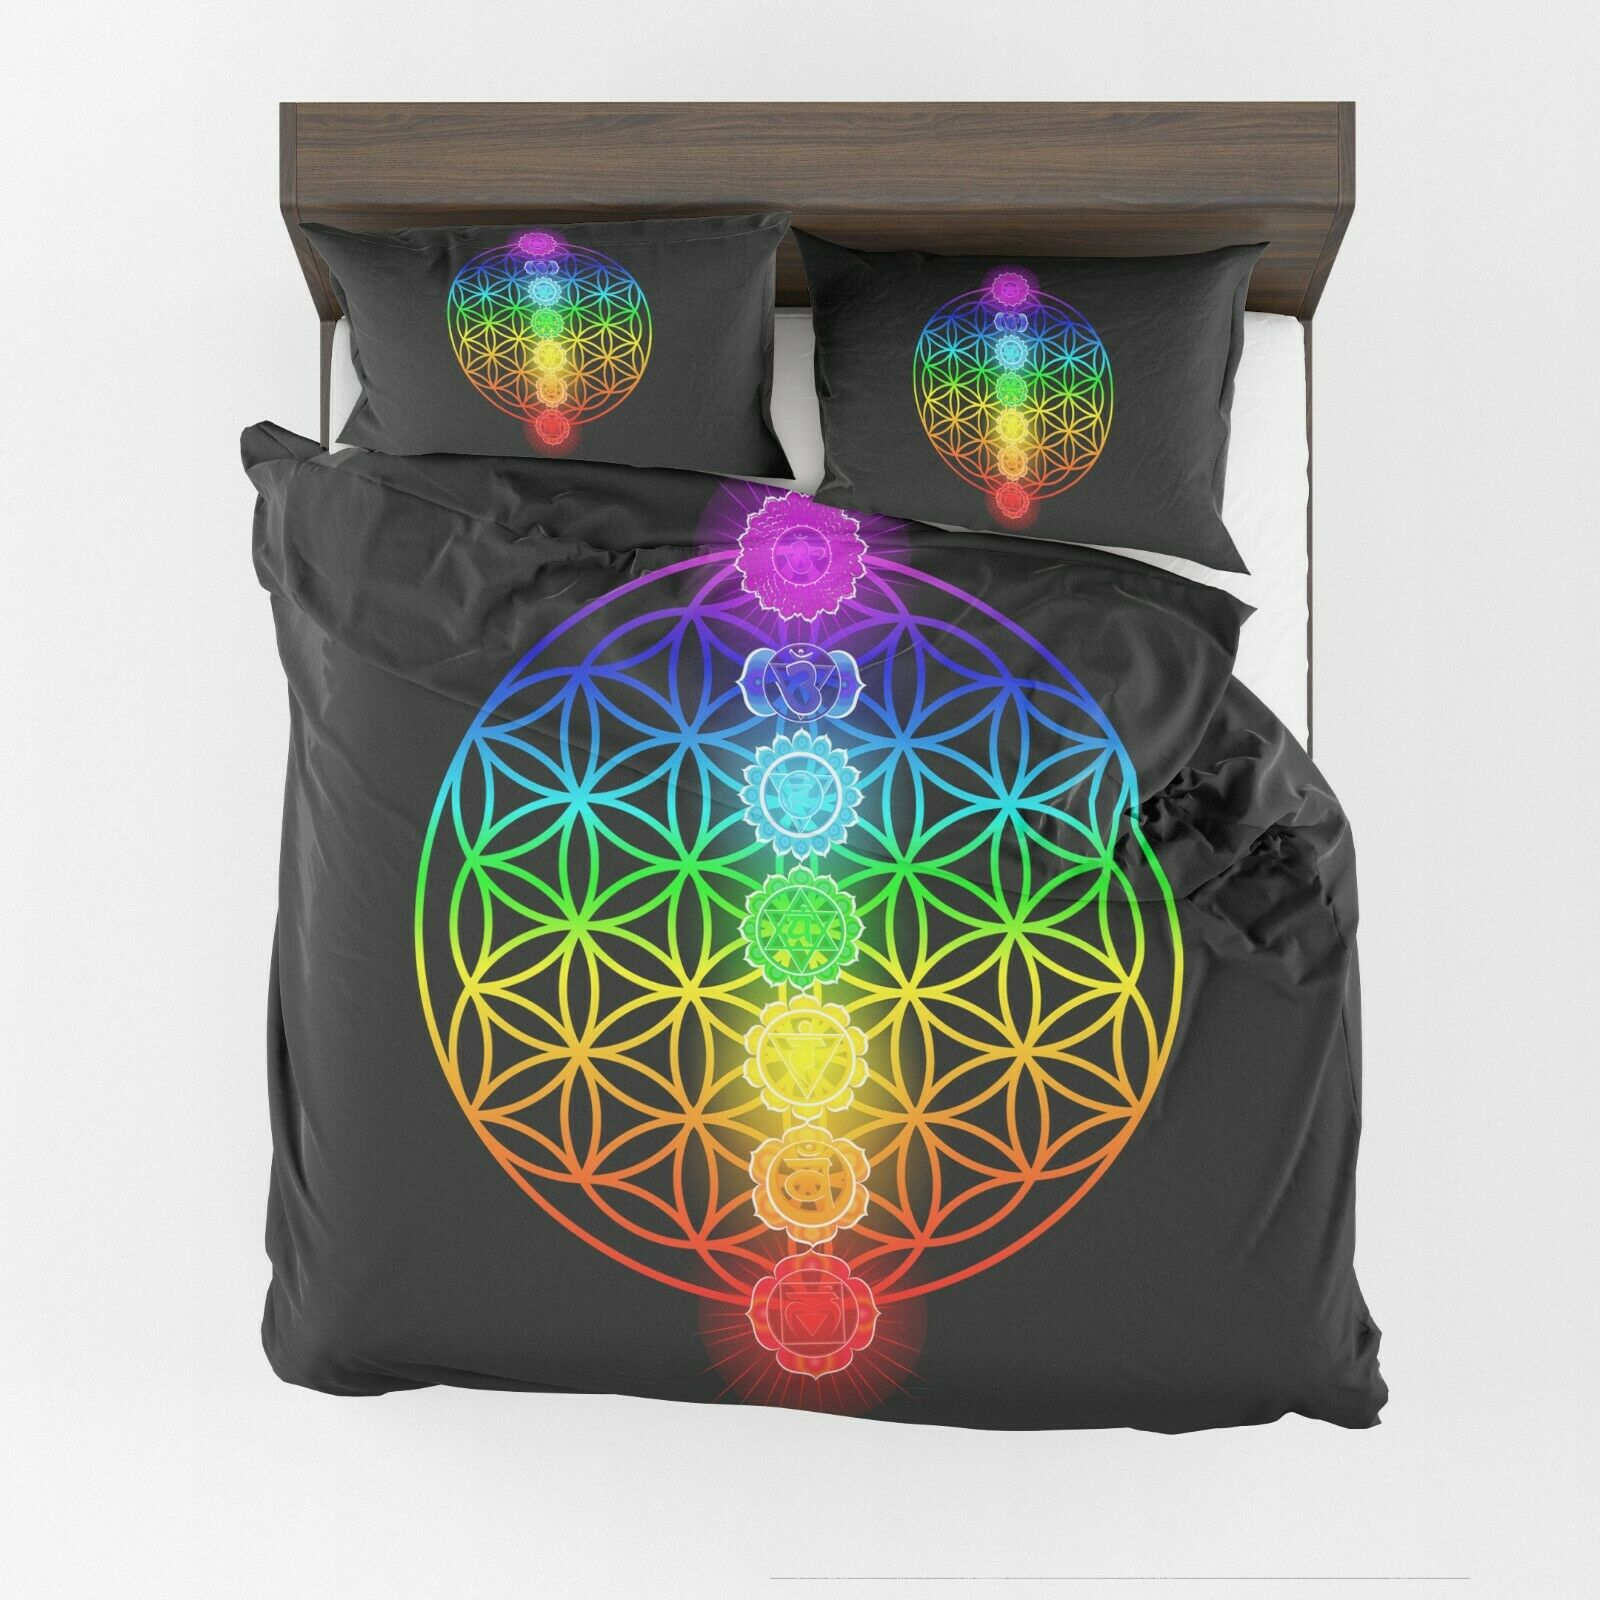 FFaibleer of Life Comforter or Duvet Cover chakra bedding sacrouge geometry bedding